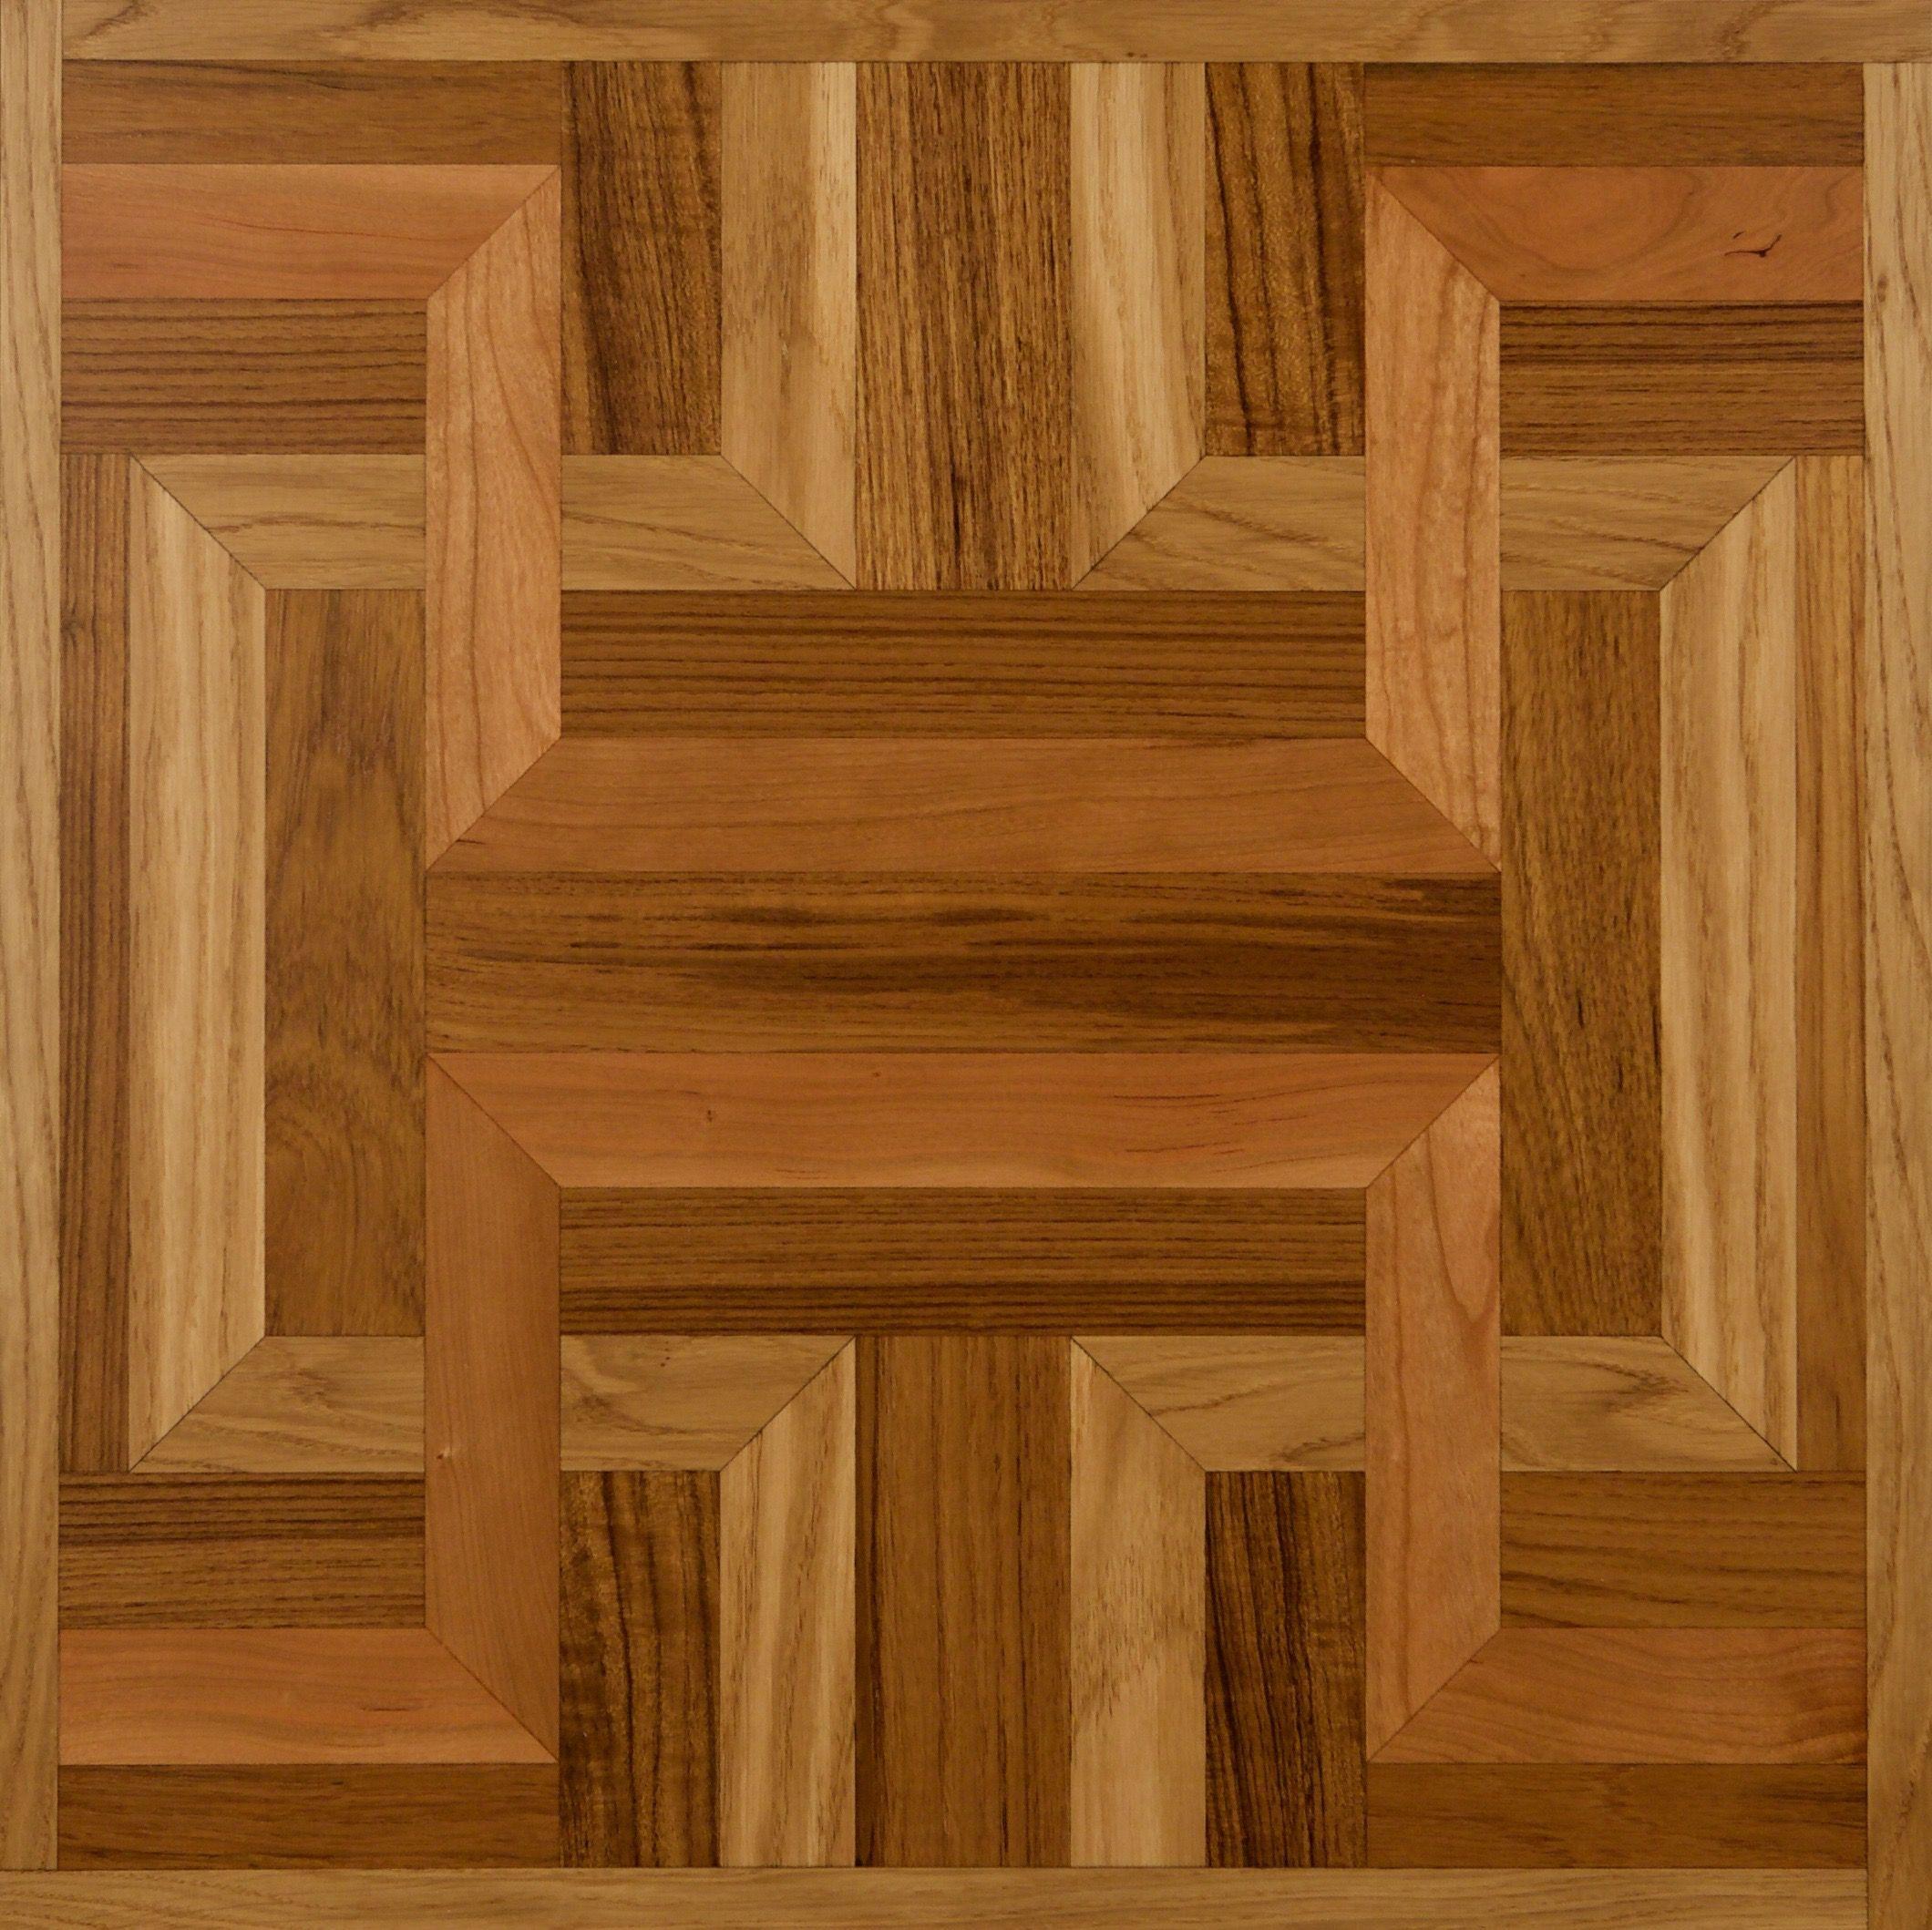 Pattern Floor Pavimenti Legno Parquet